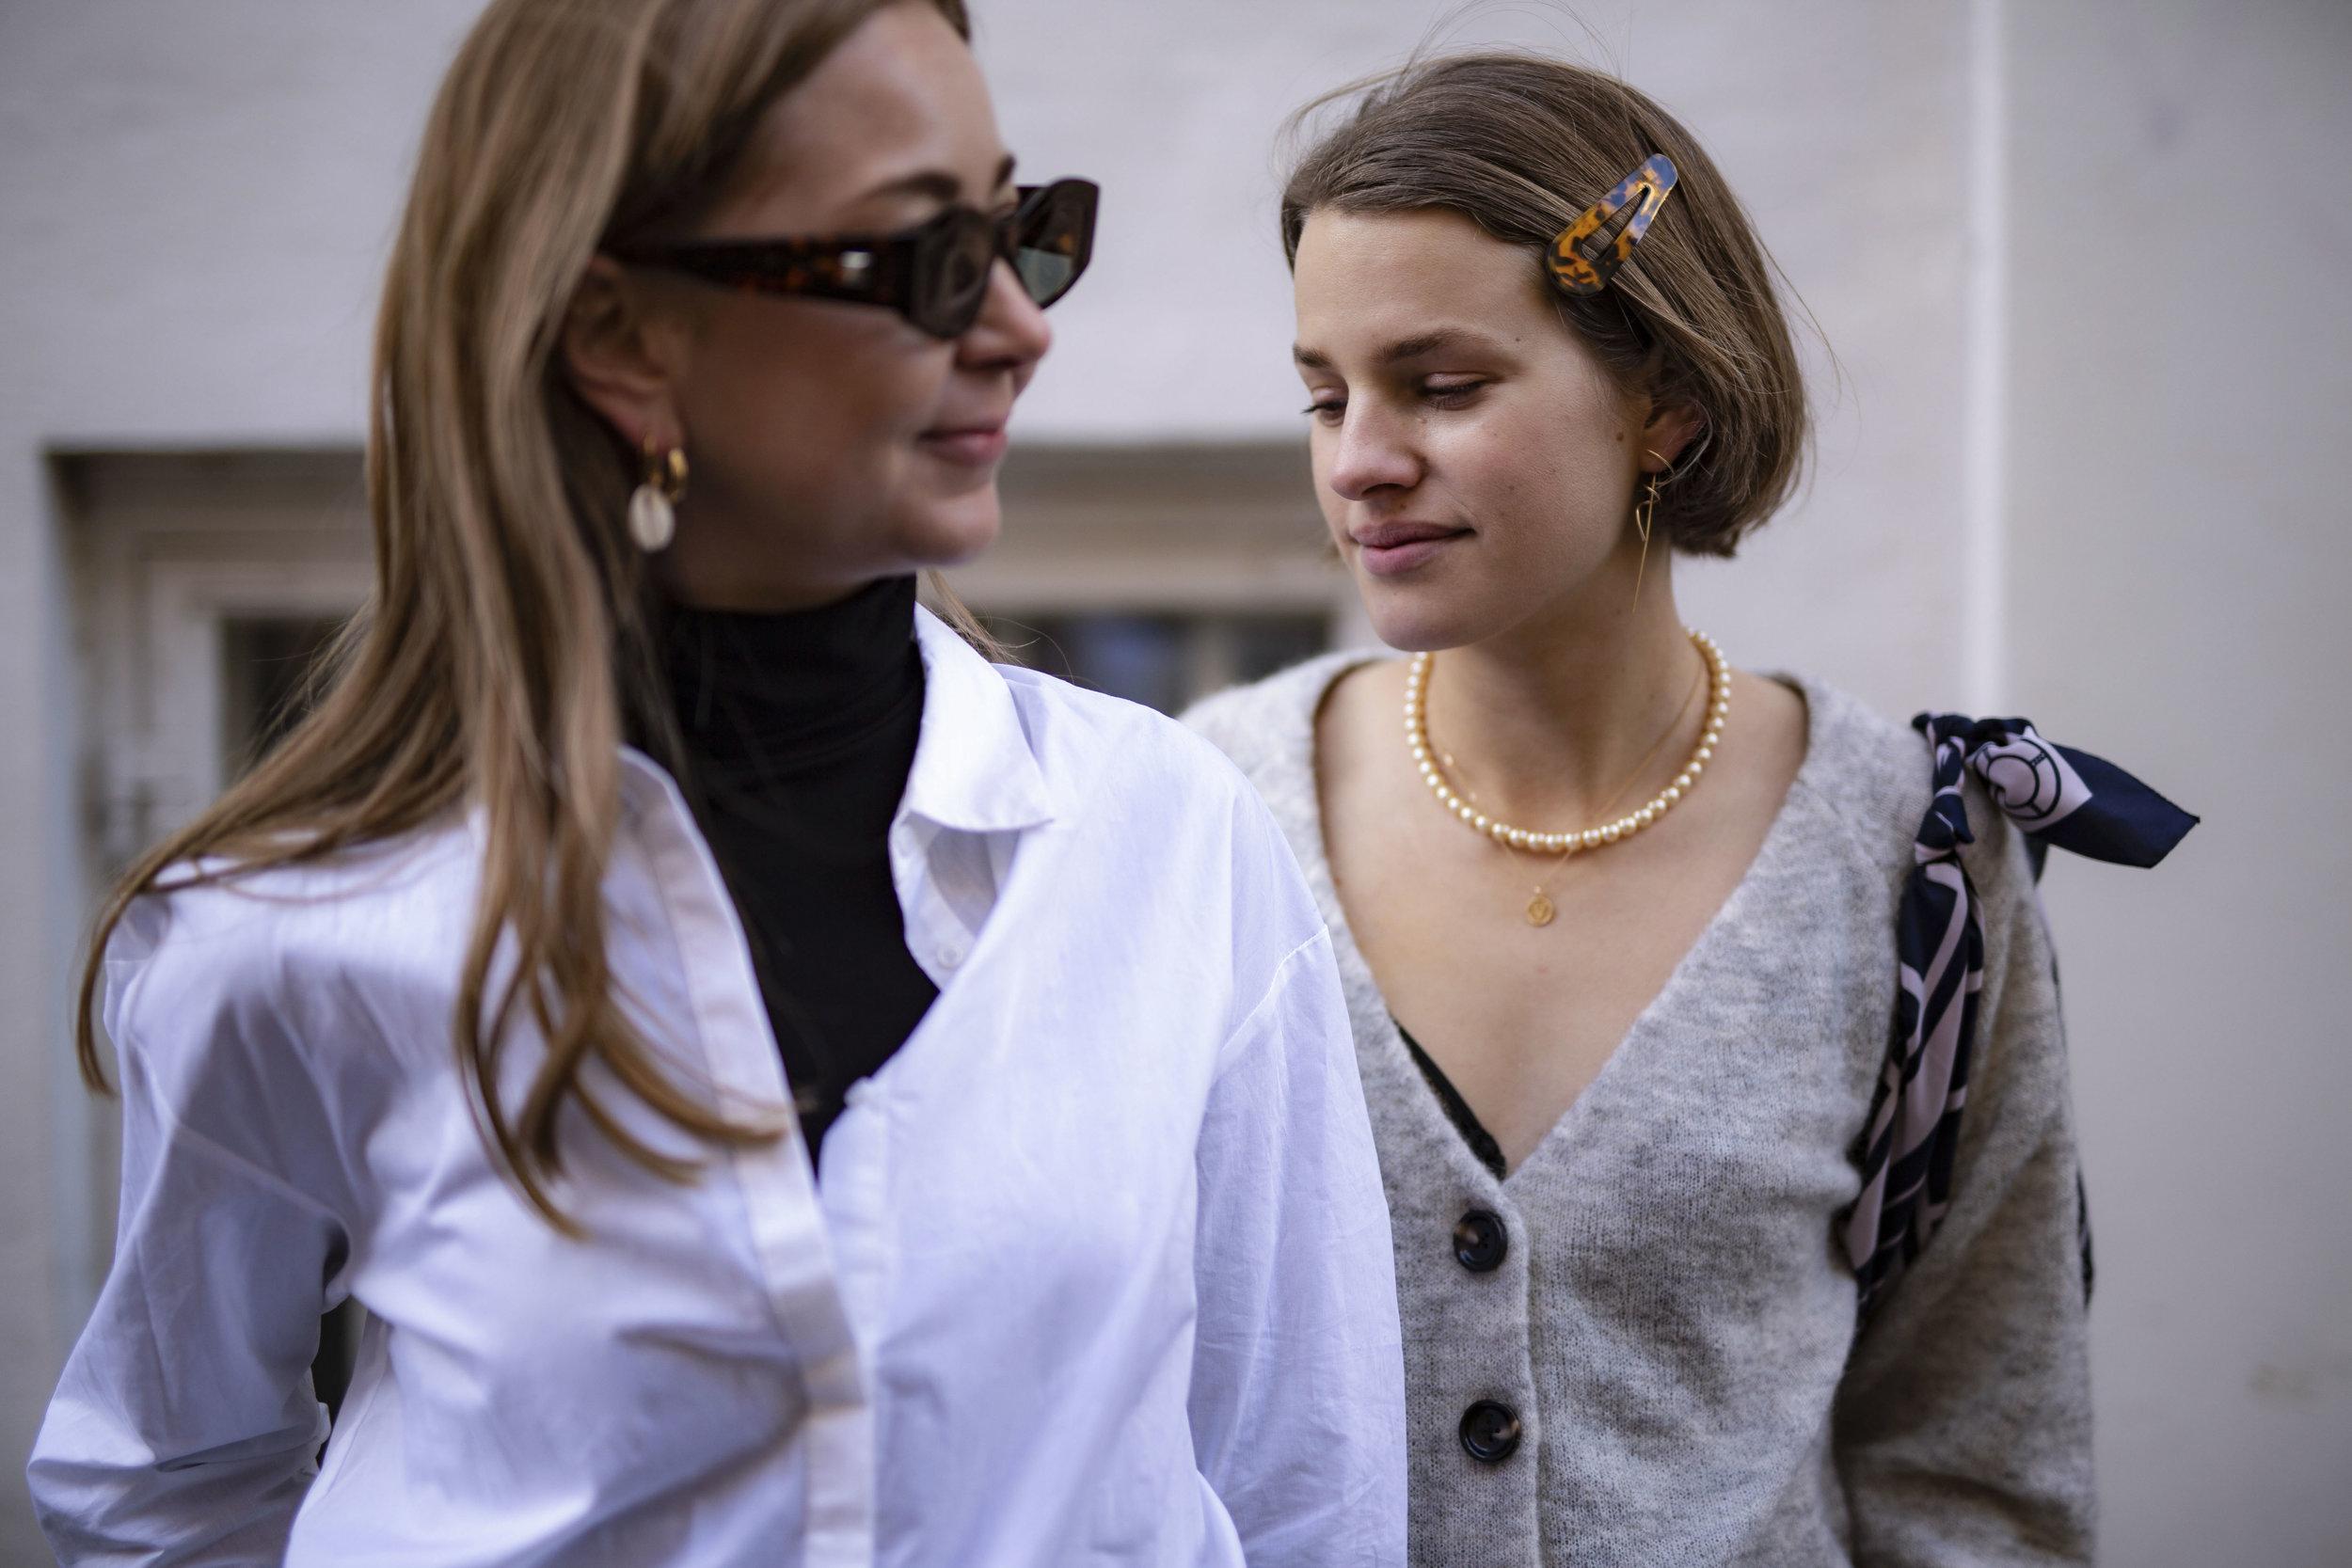 Katrine Krog and Julie Blichfeld on the streets of Copenhagen wearing Denim Hunter clothes